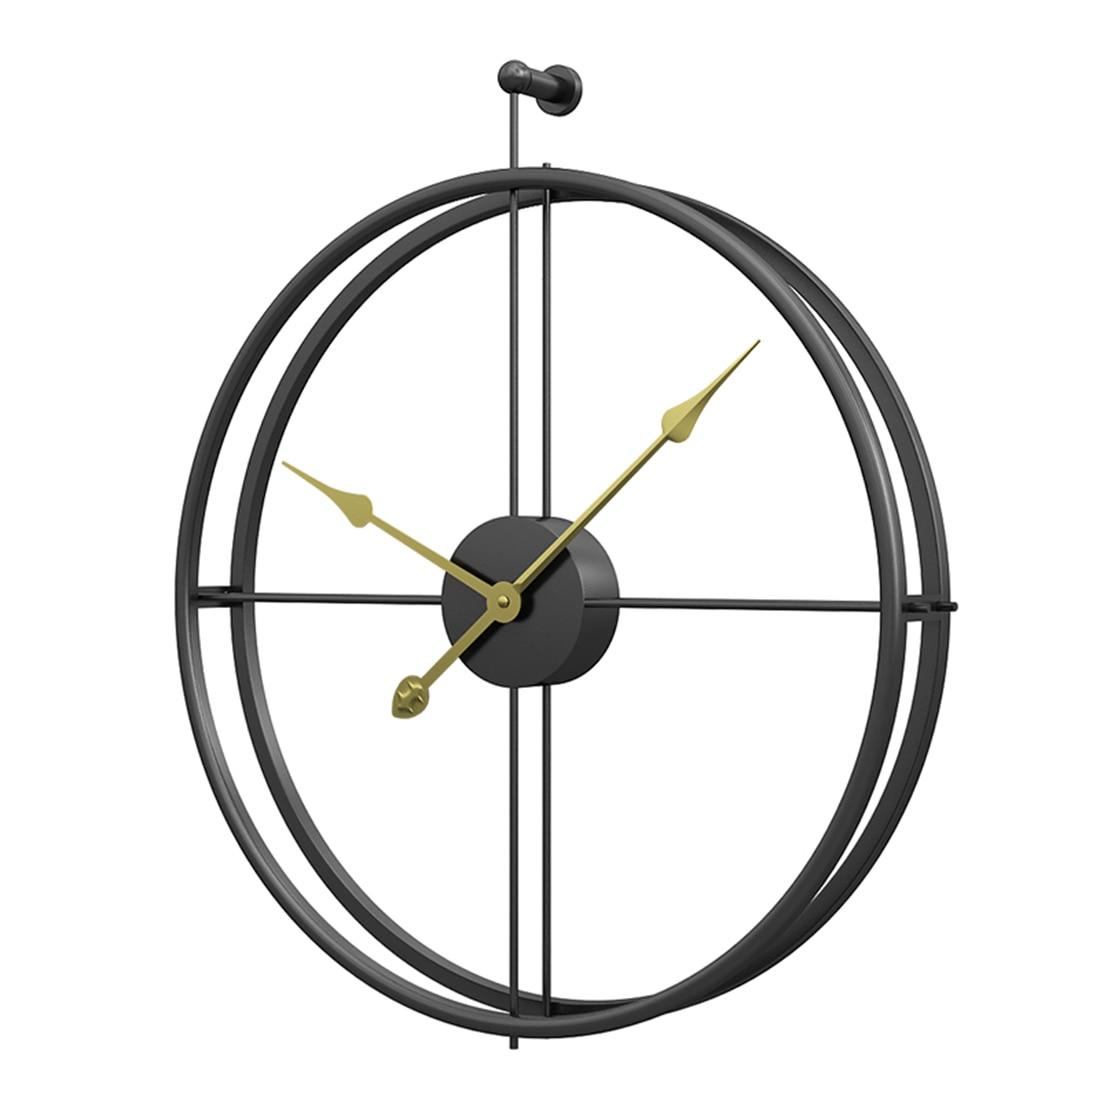 US $39.49 50% OFF 55cm Large Silent Wall Clock Modern Design Clocks Home  livingroom Decor Office European Style Hanging Wall Watch Clocks 2019-in  Wall ...